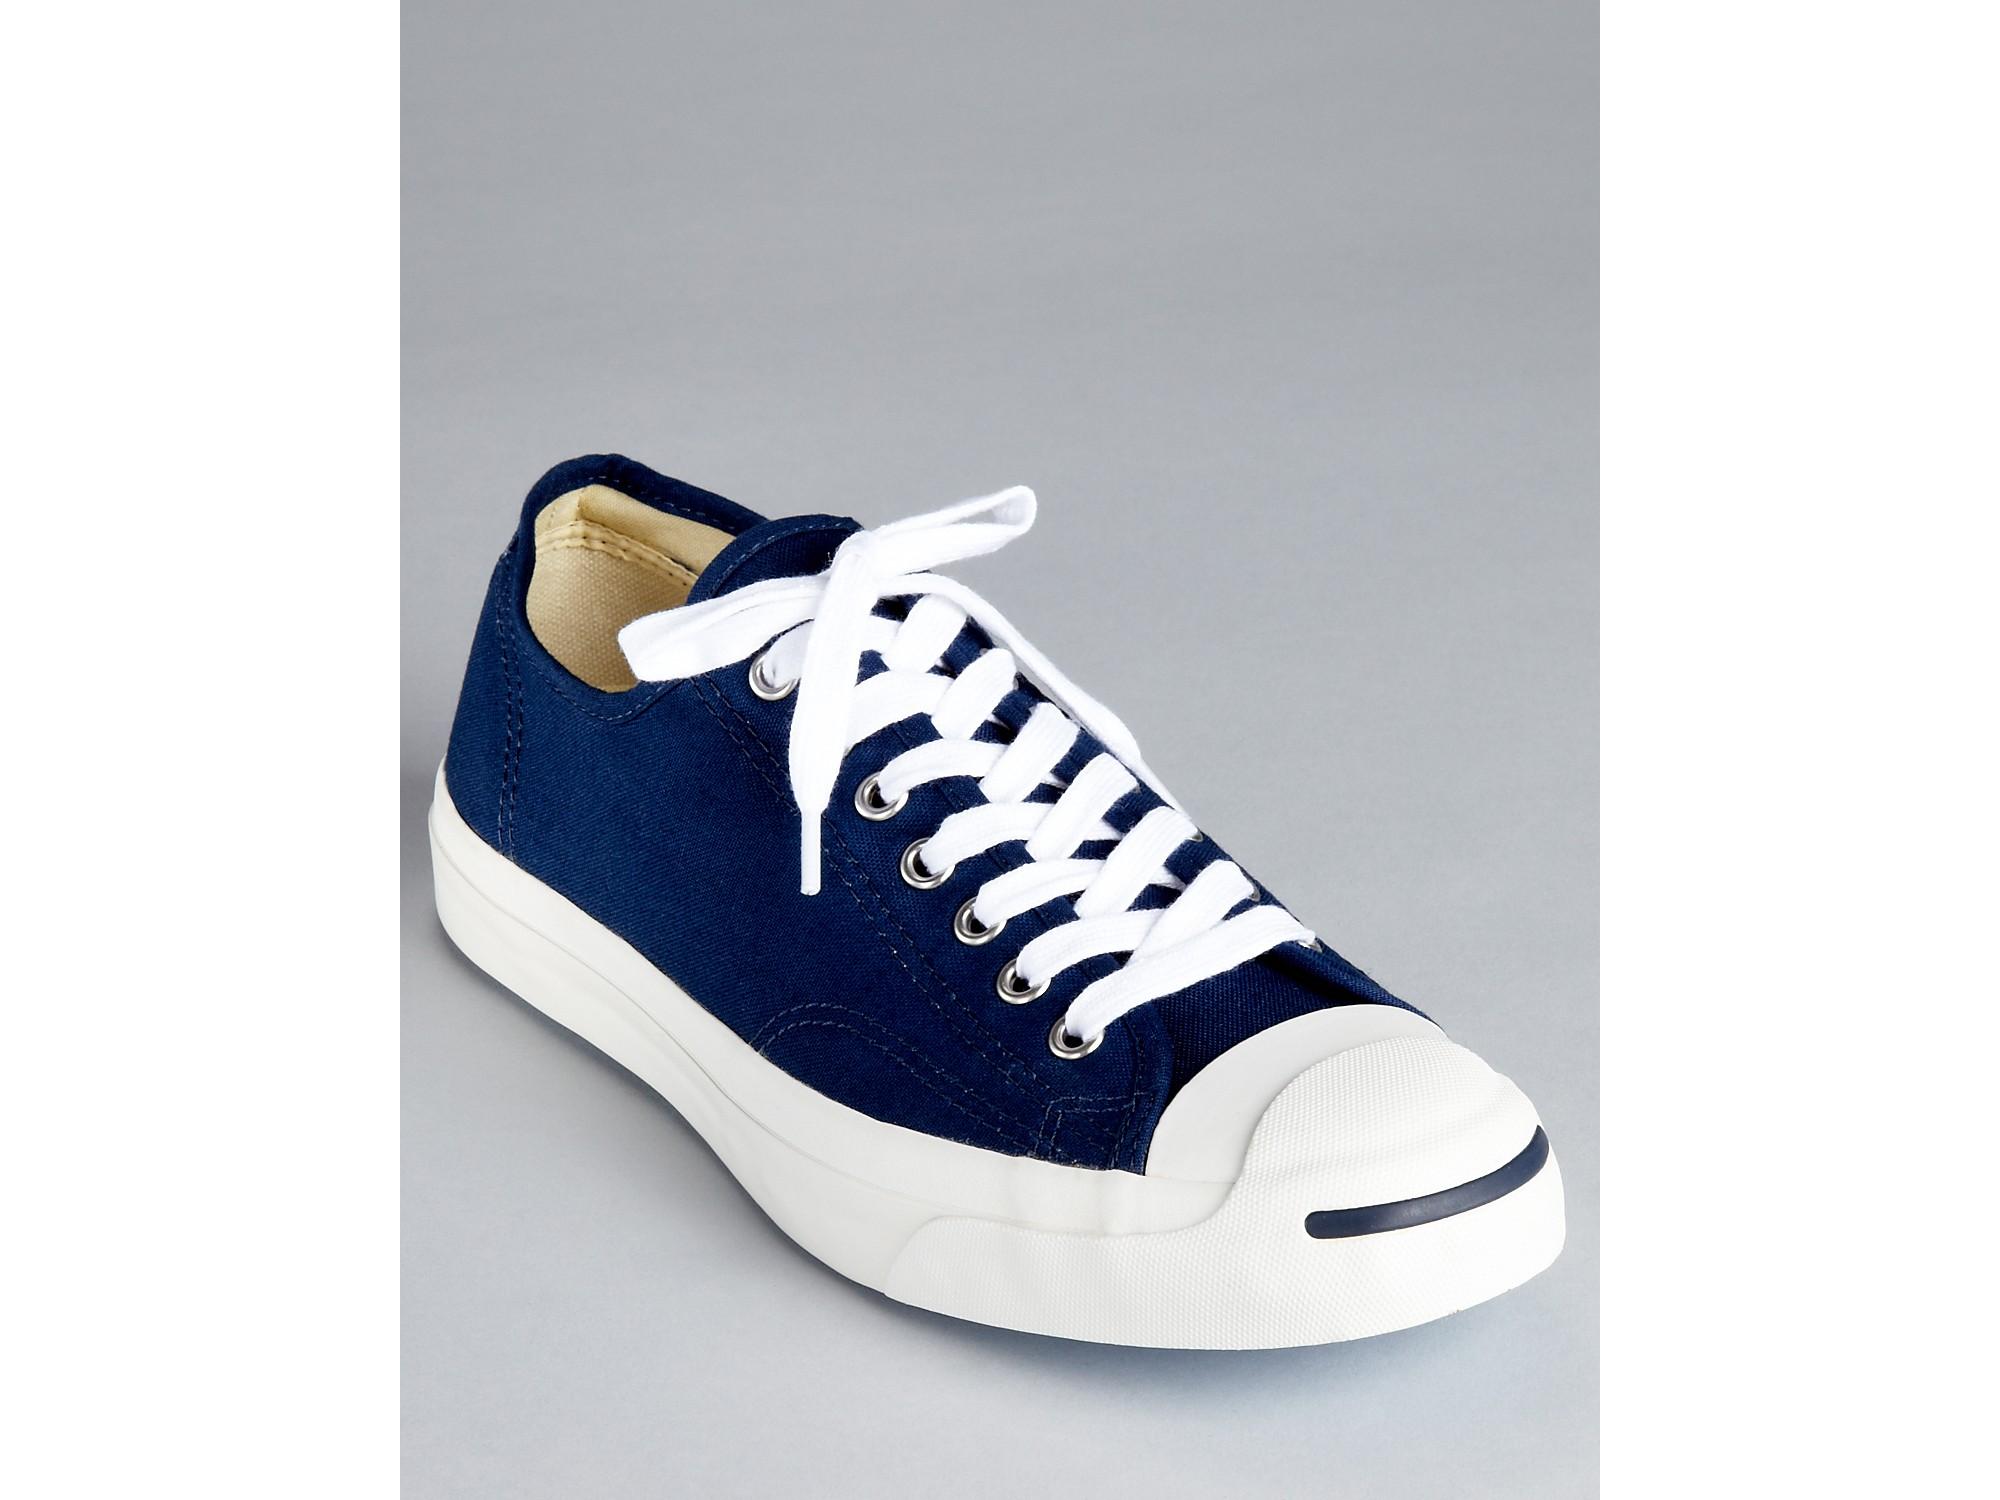 3d578d32d4cd ... black 68313 8855b  promo code for lyst converse jack purcell ltt  sneakers in blue for men 86cbd 8472e